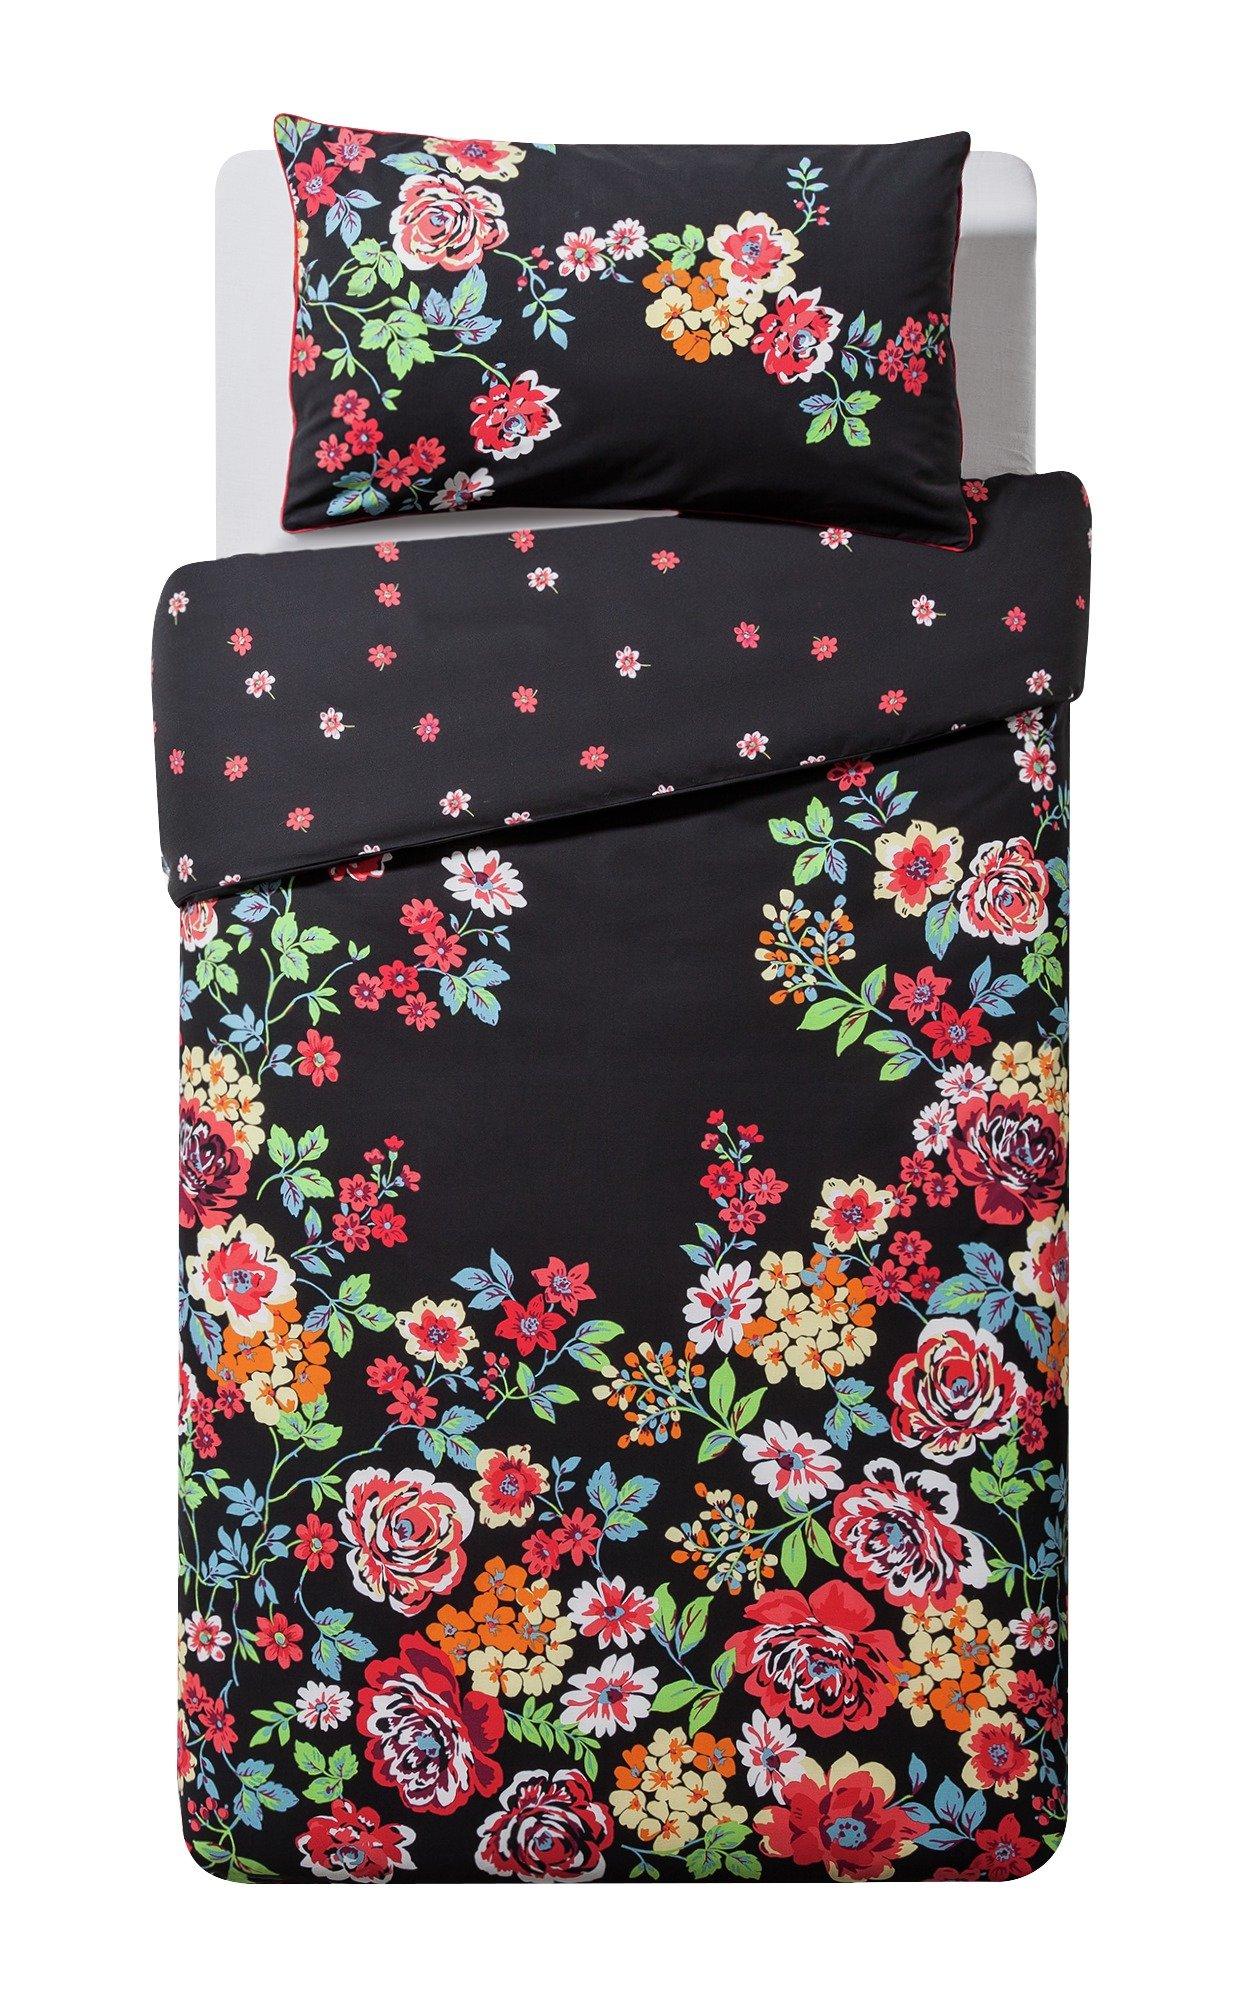 Argos Home Gypsy Floral Bedding Set - Single